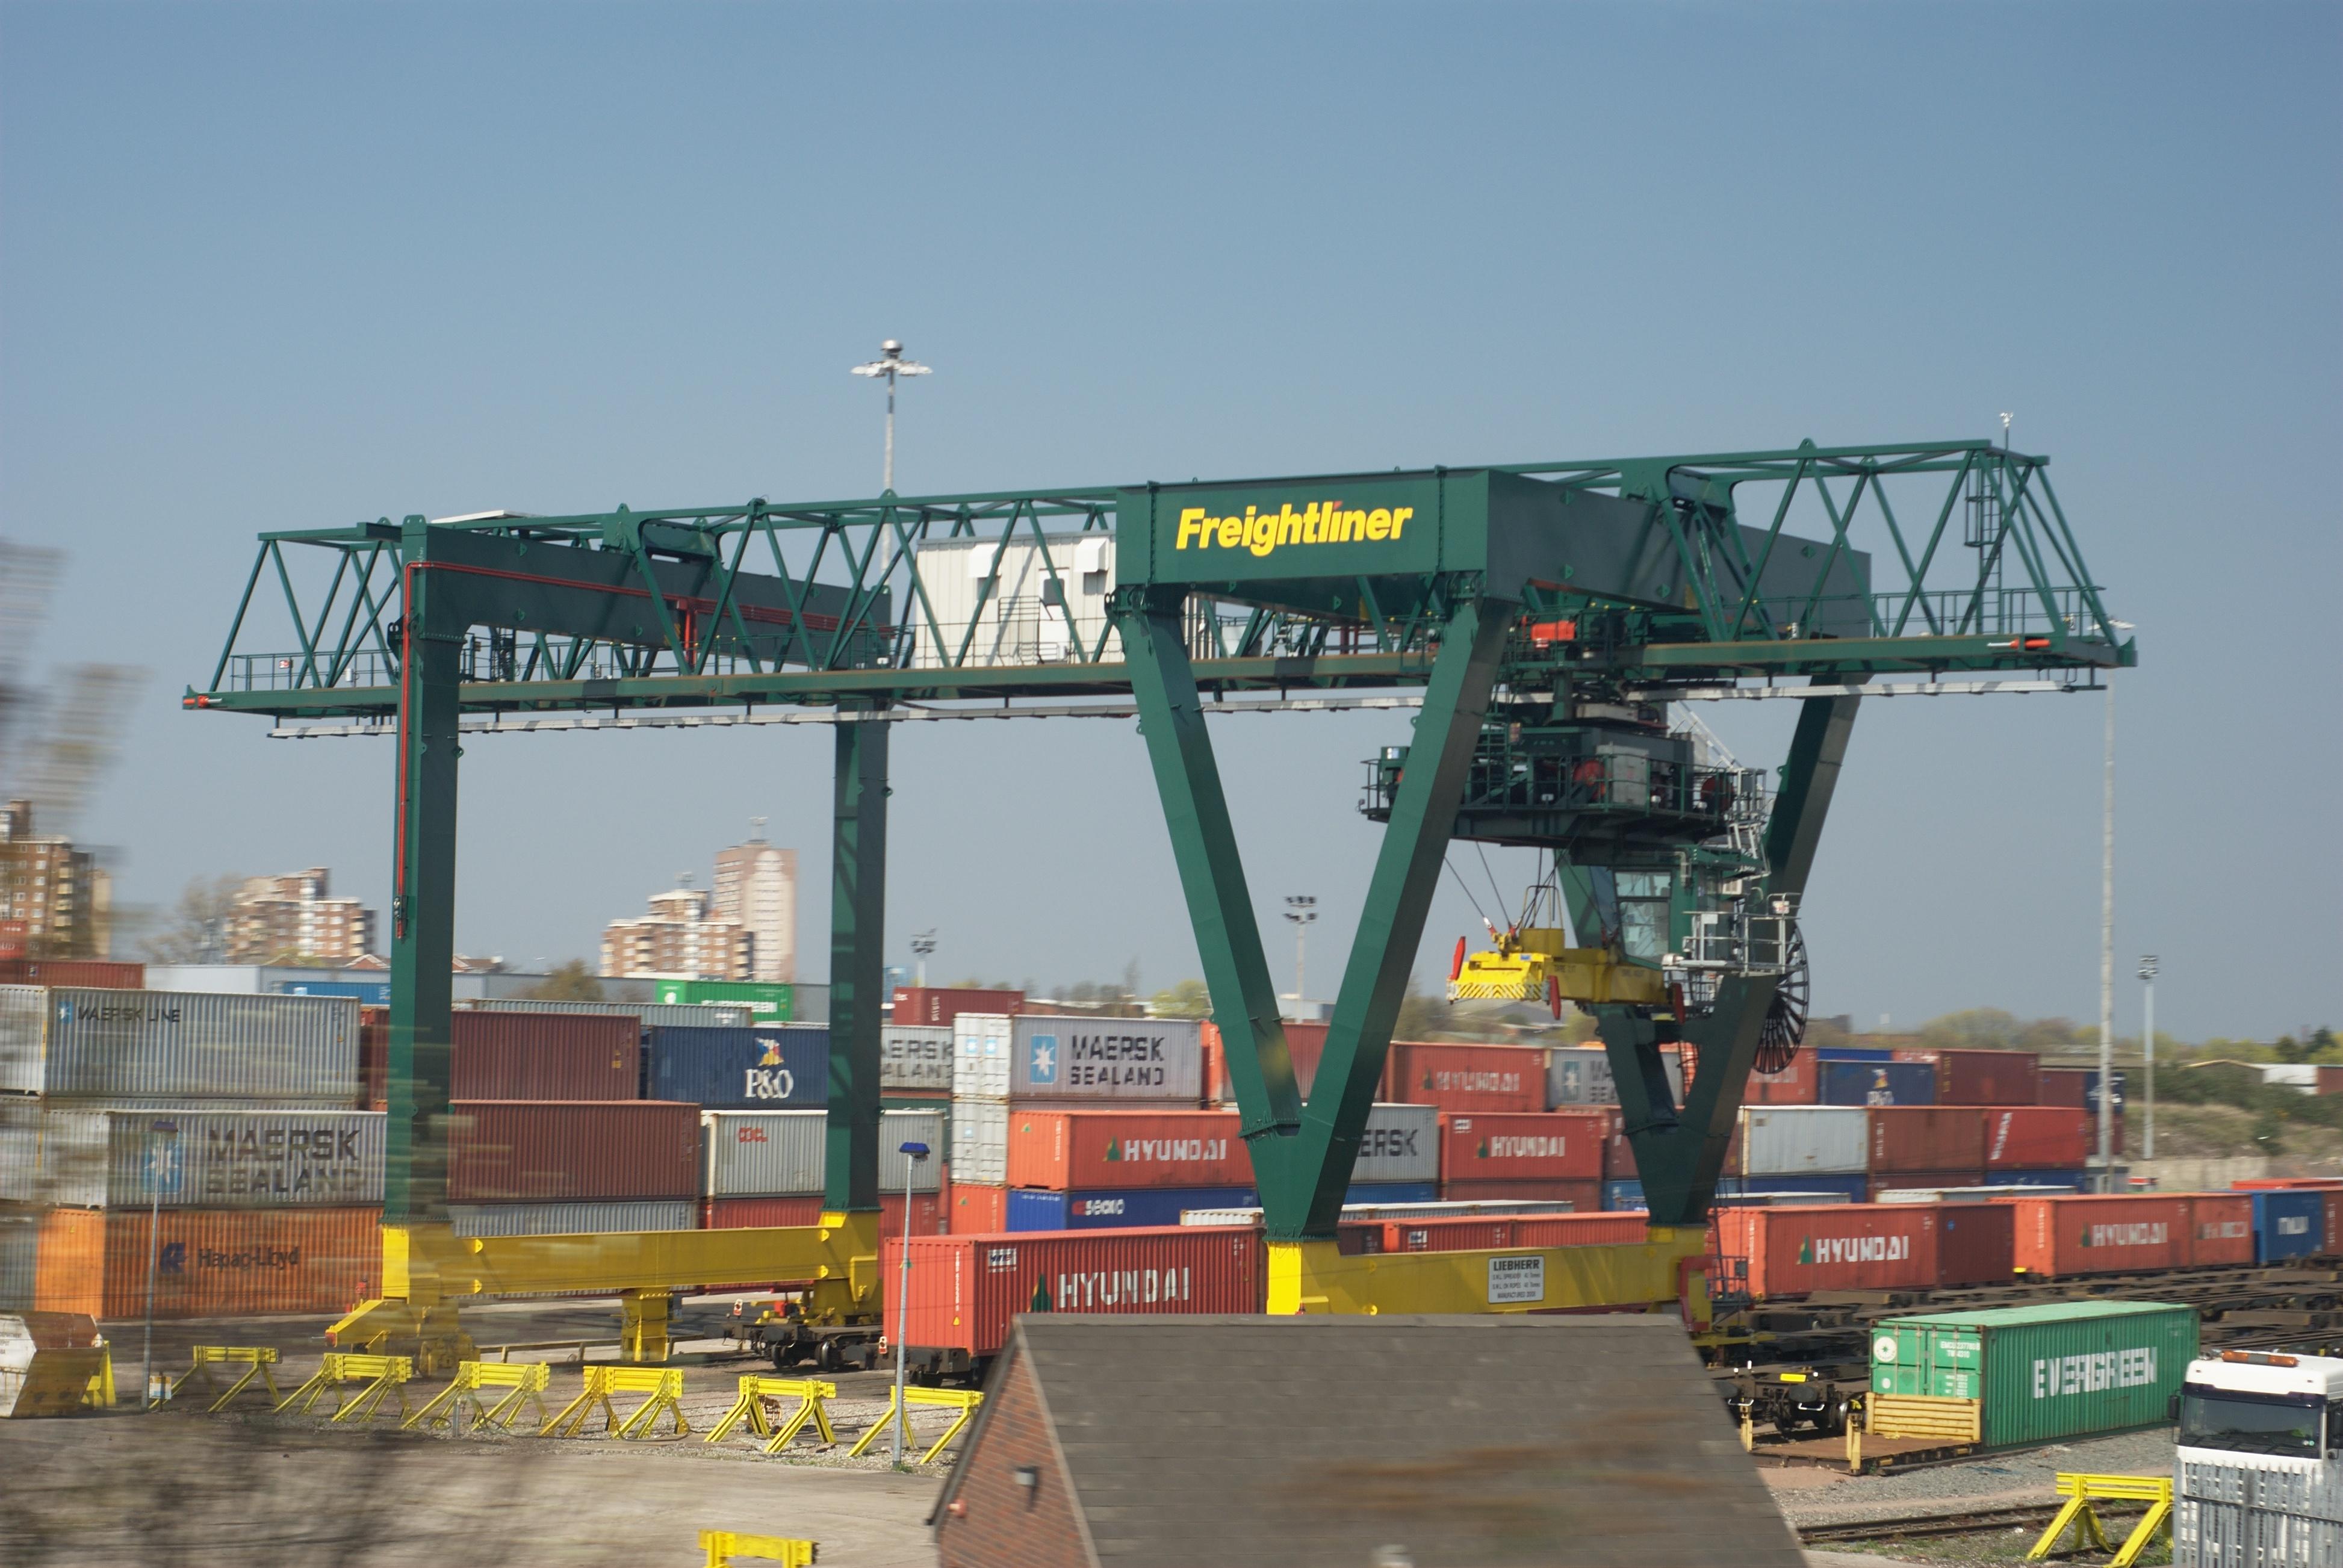 Over Head Cranes : File freightliner overhead crane g wikimedia commons